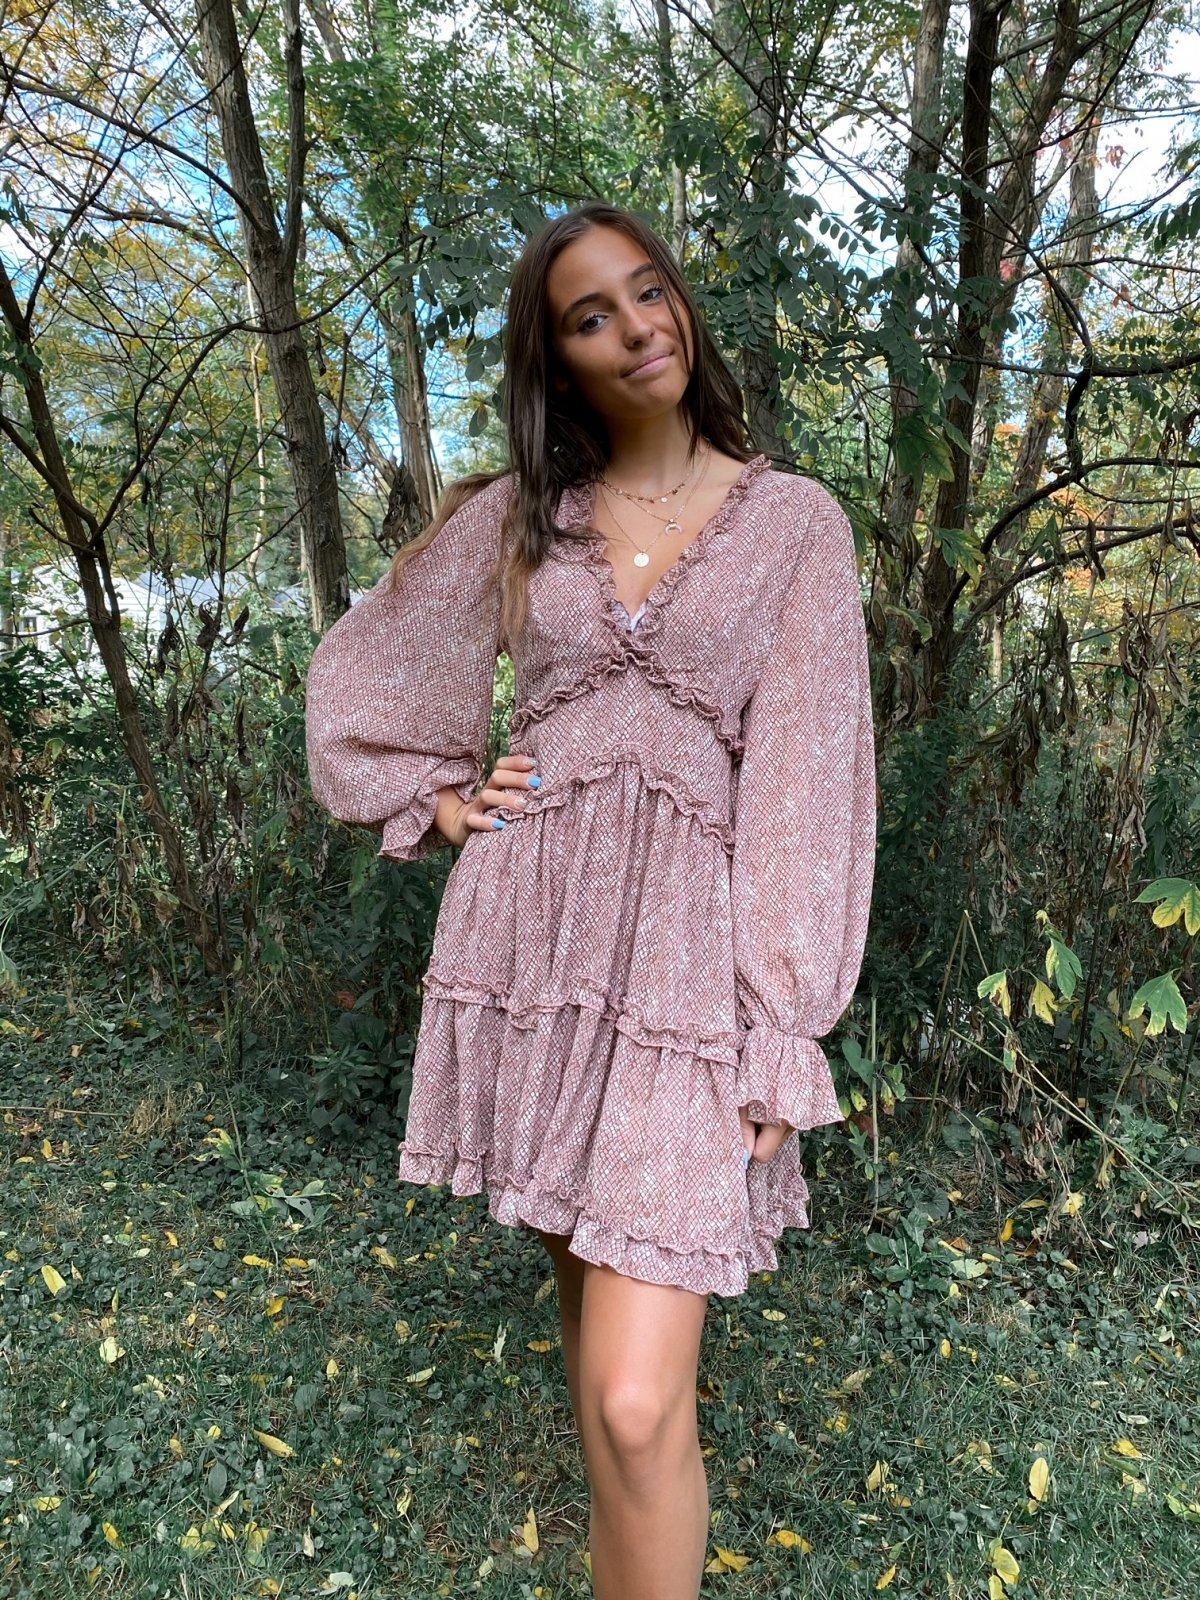 SS Assorted Fall Dress